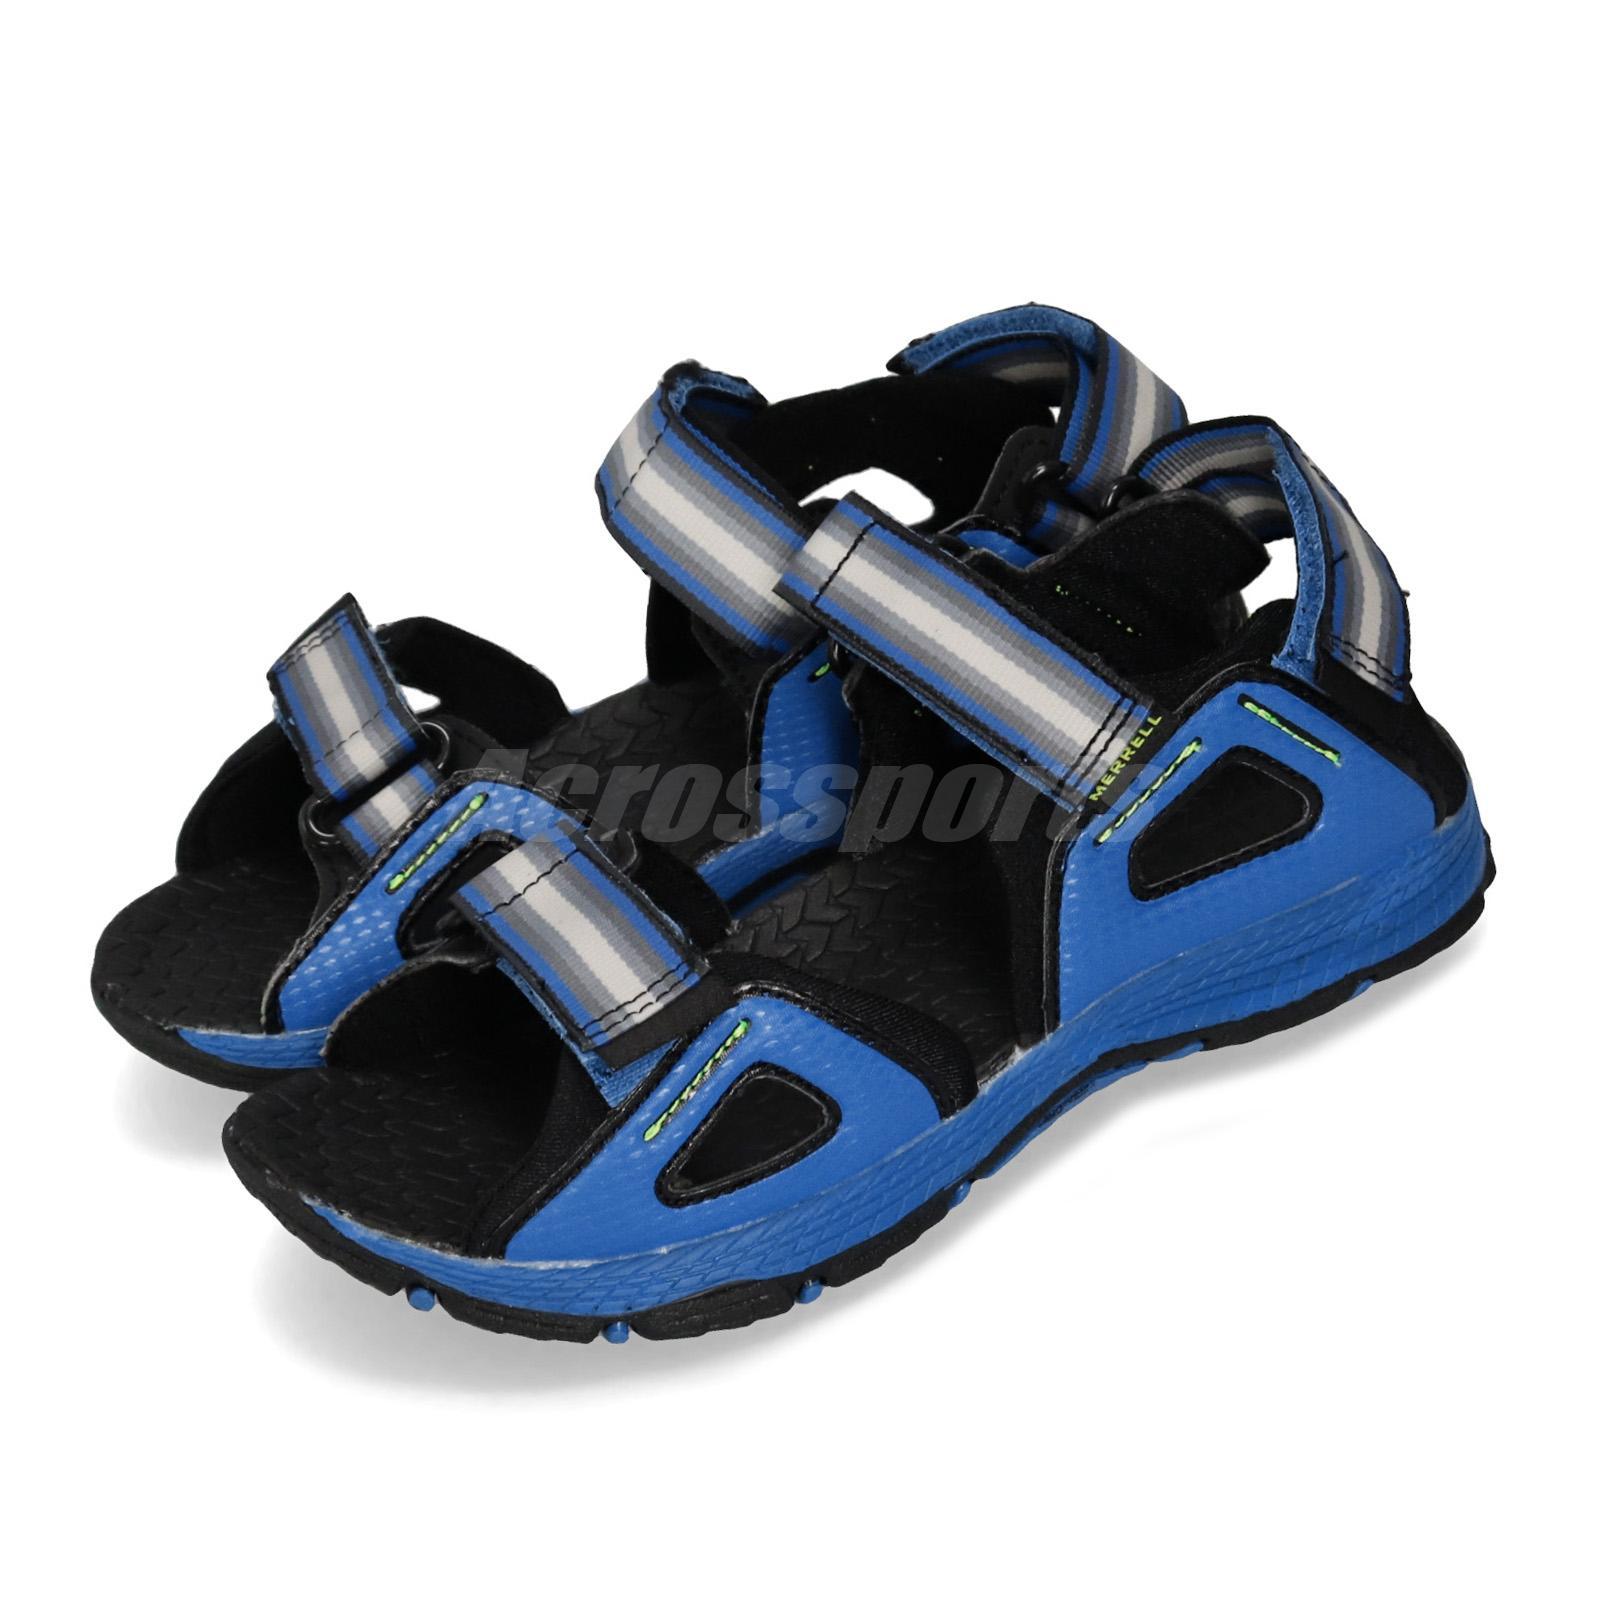 Merrell Kids Hydro Blaze Sandal